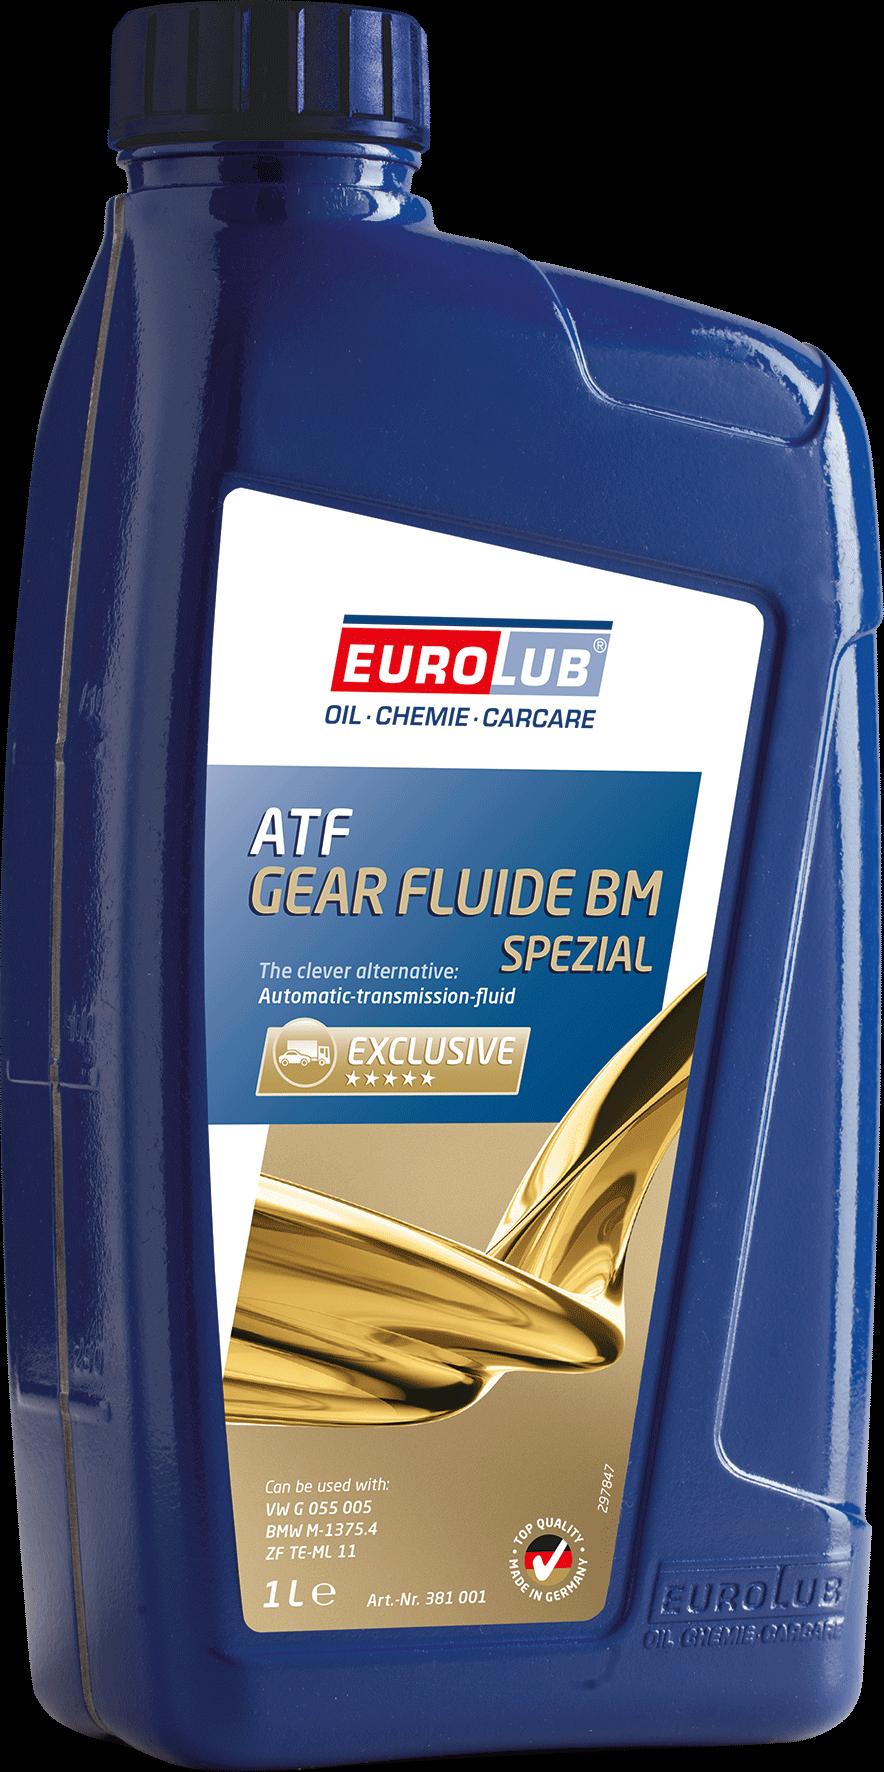 EUROLUB Gear Fluide BM Spezial, 1л